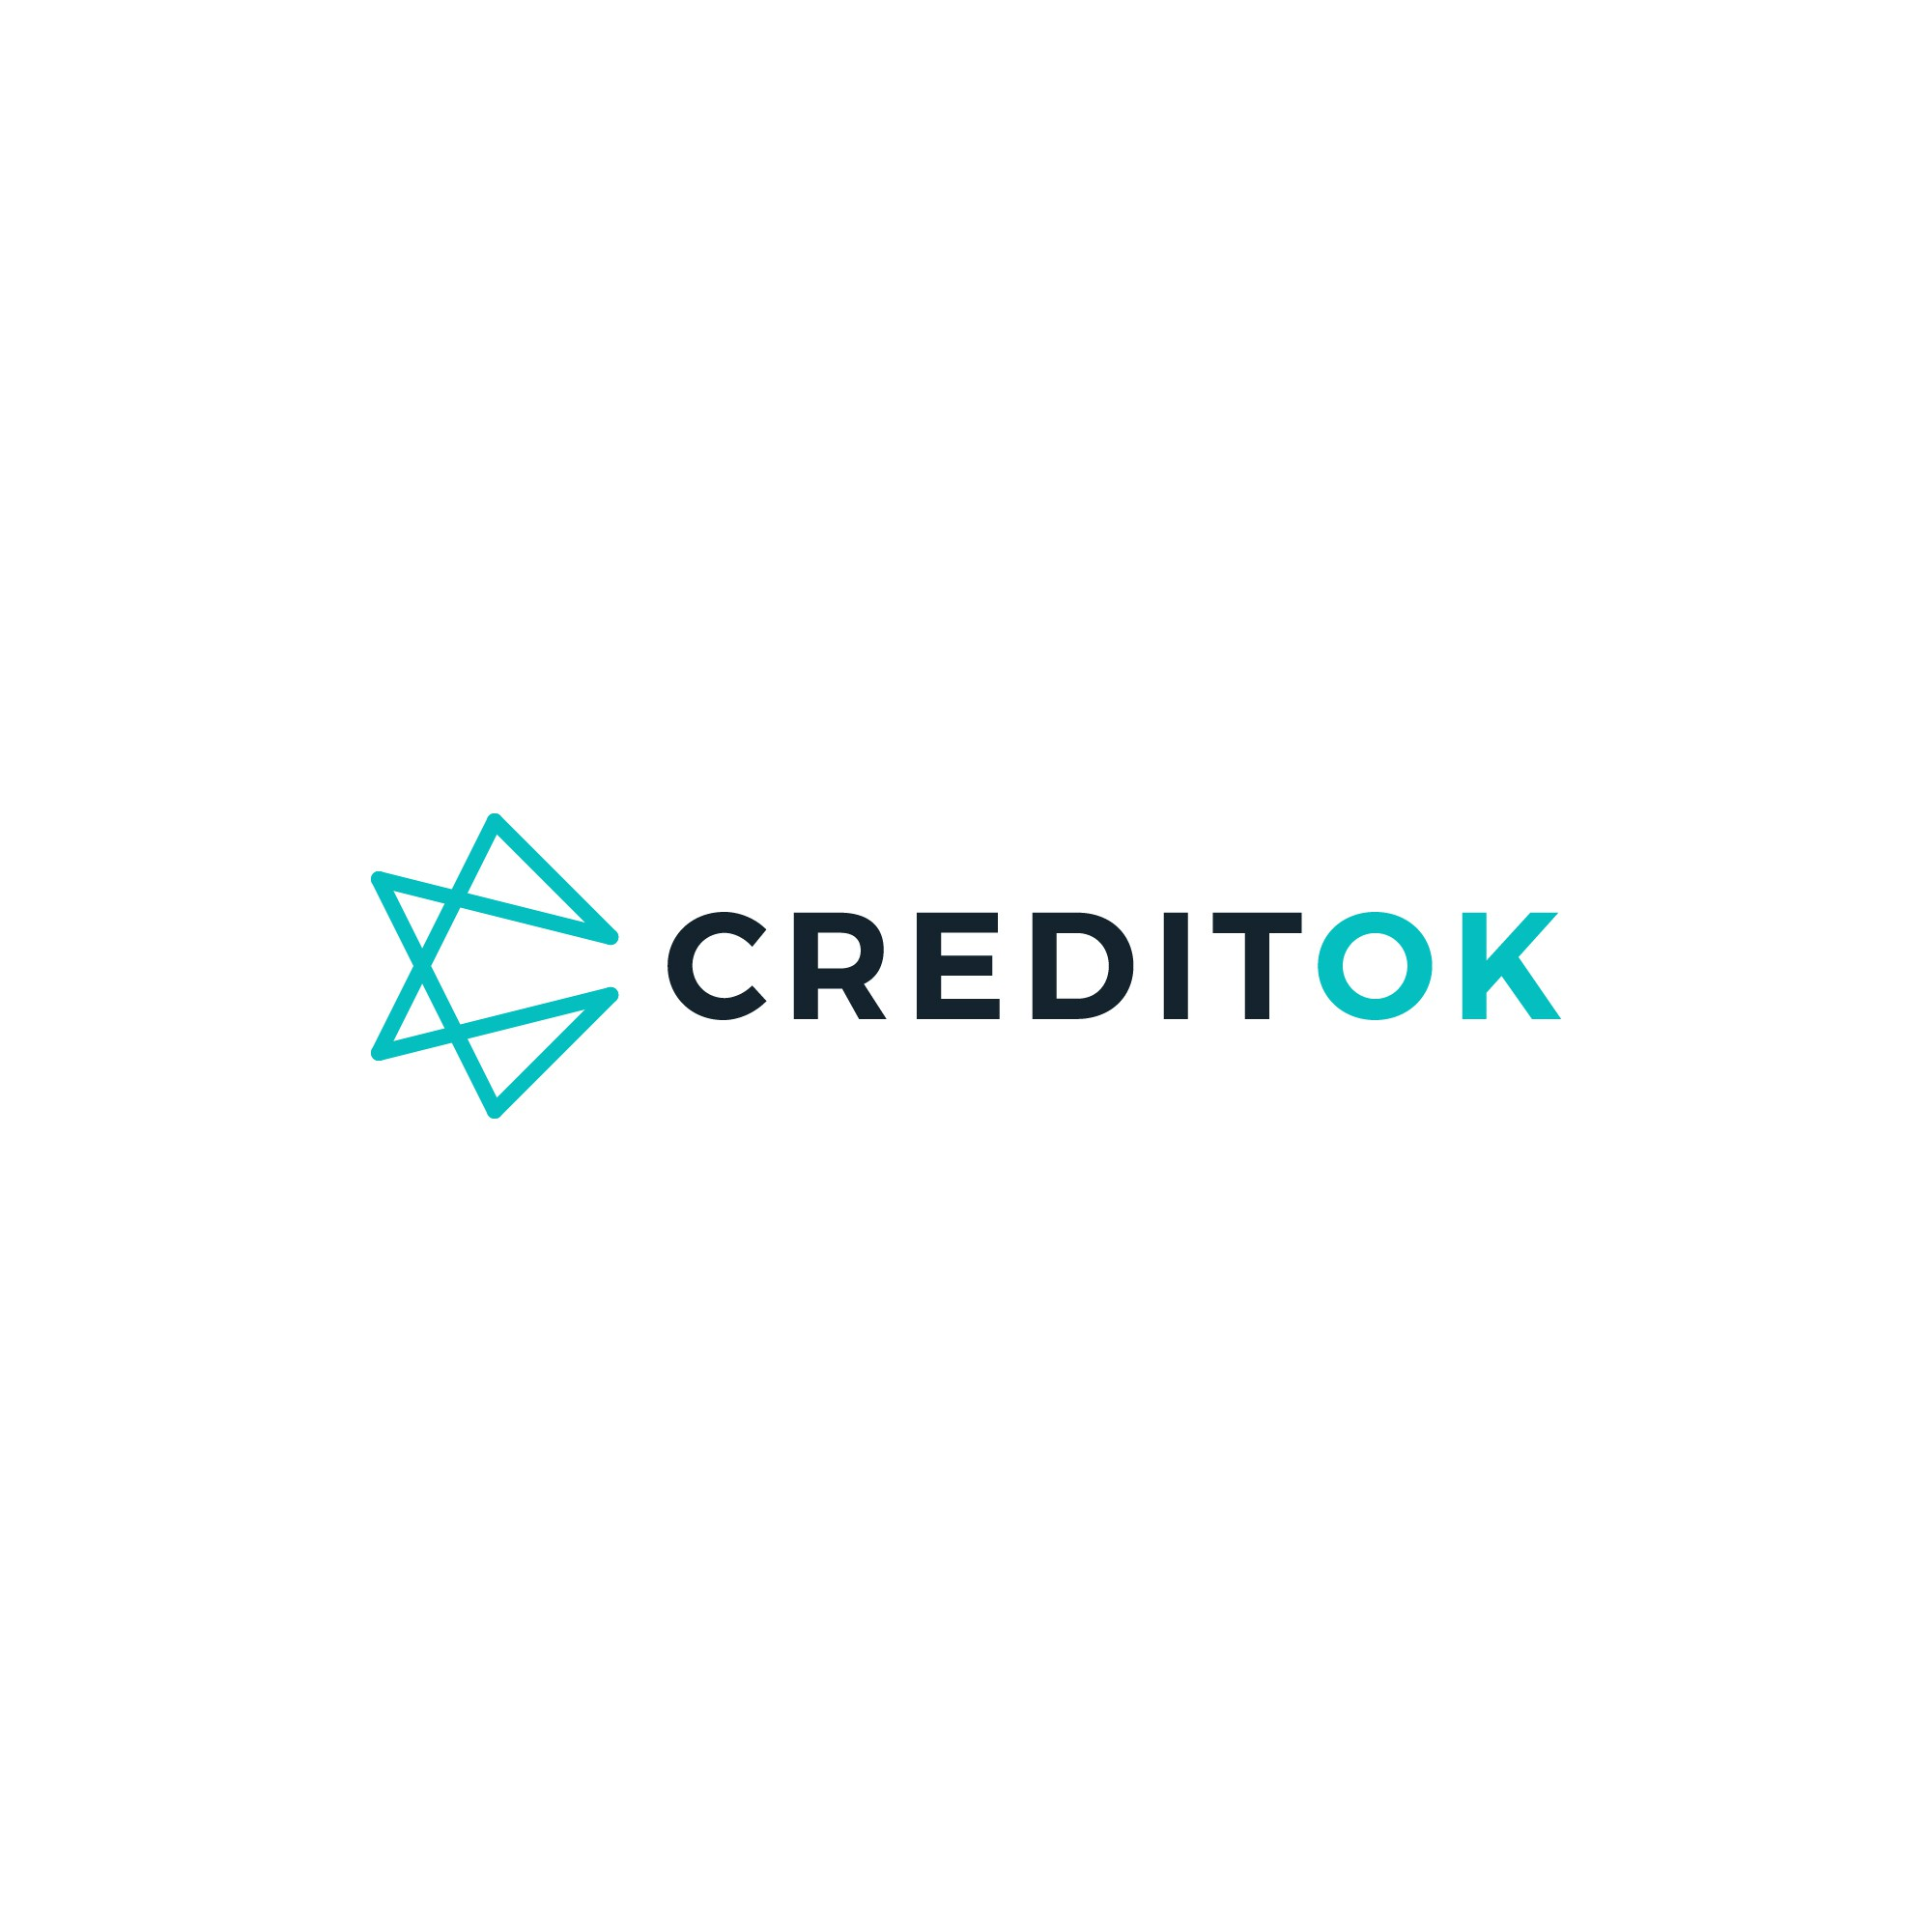 Logo for Disruptive Fintech StartUp